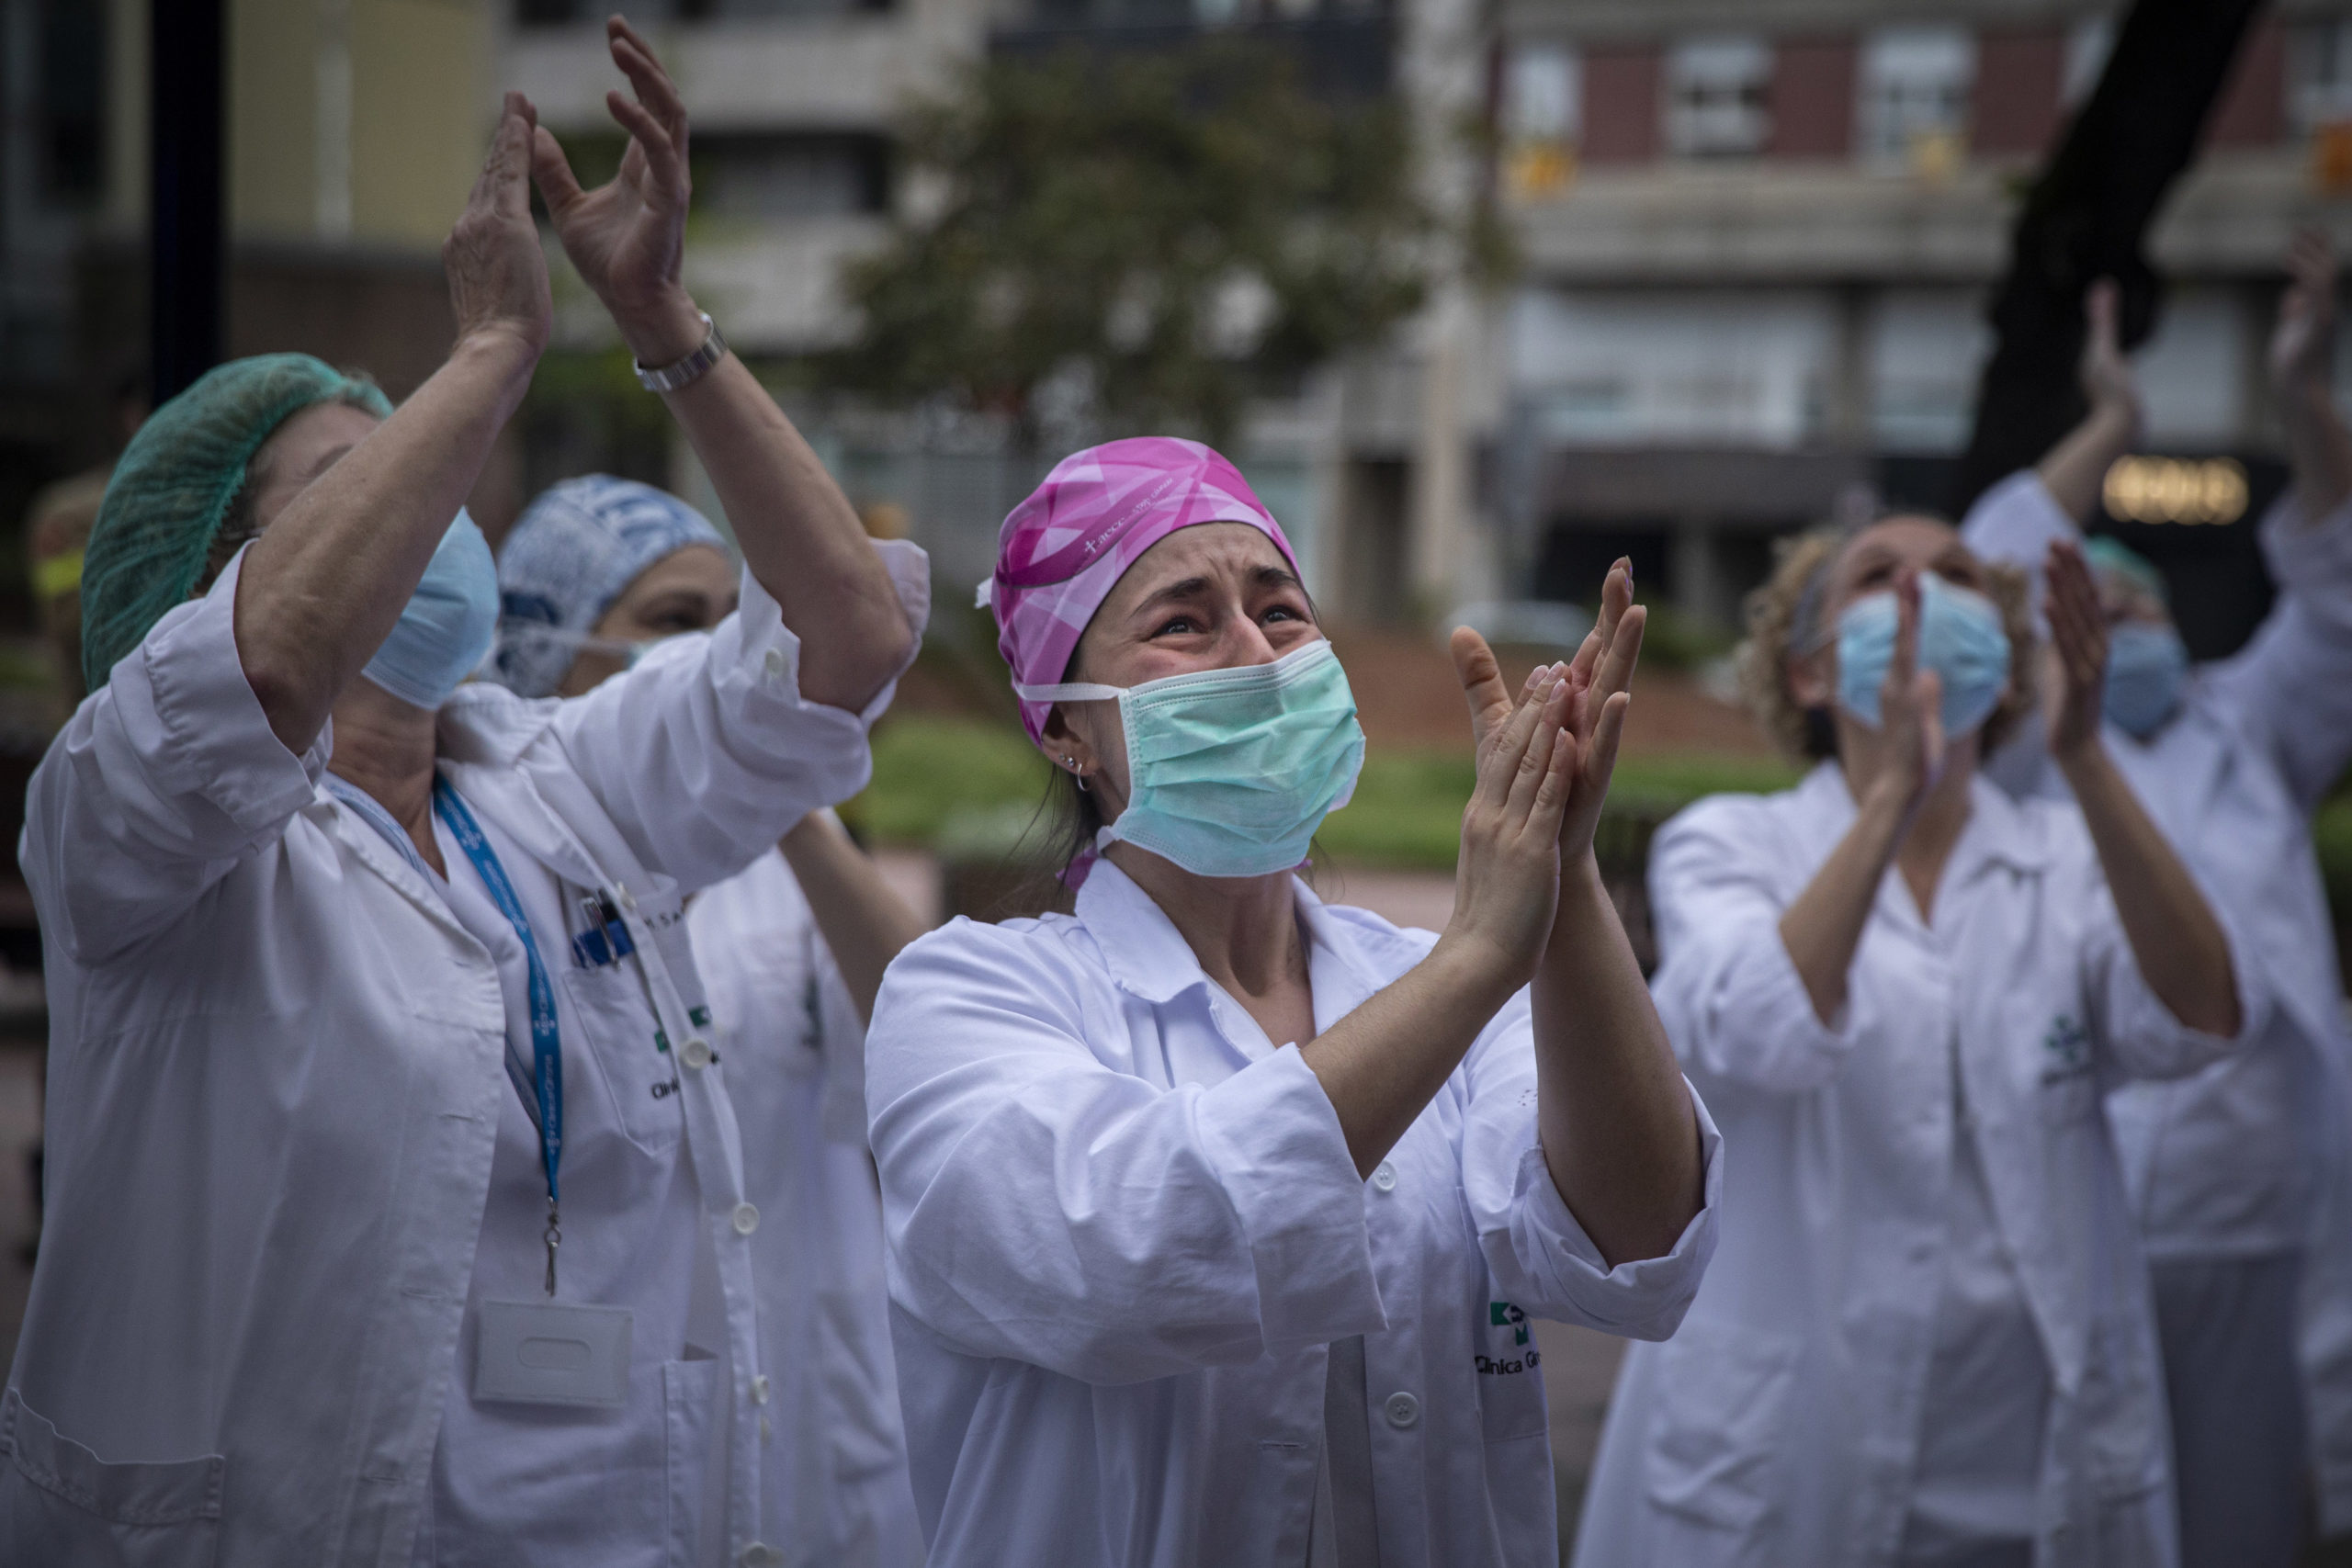 ARCHIVO COVID, la mayor plataforma fotográfica sobre la pandemia